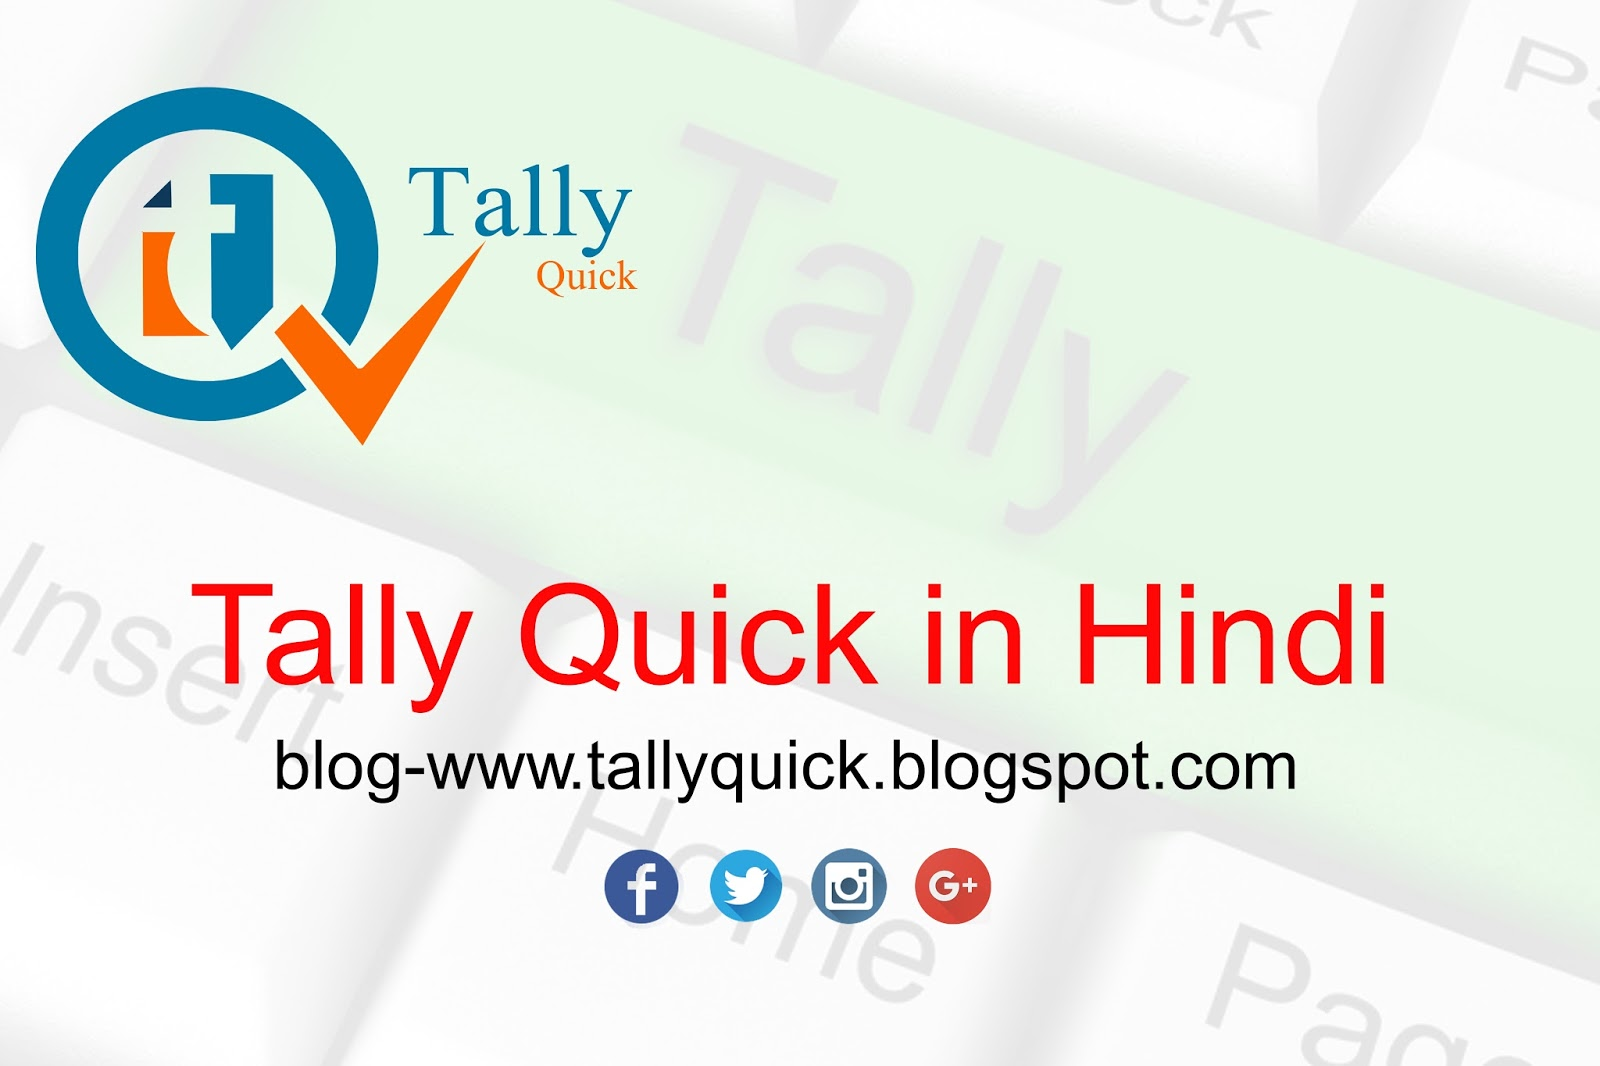 Tally Quick In Hindi Stock Group Kya Hote Hai Aur Ise Kaise Banate Hai